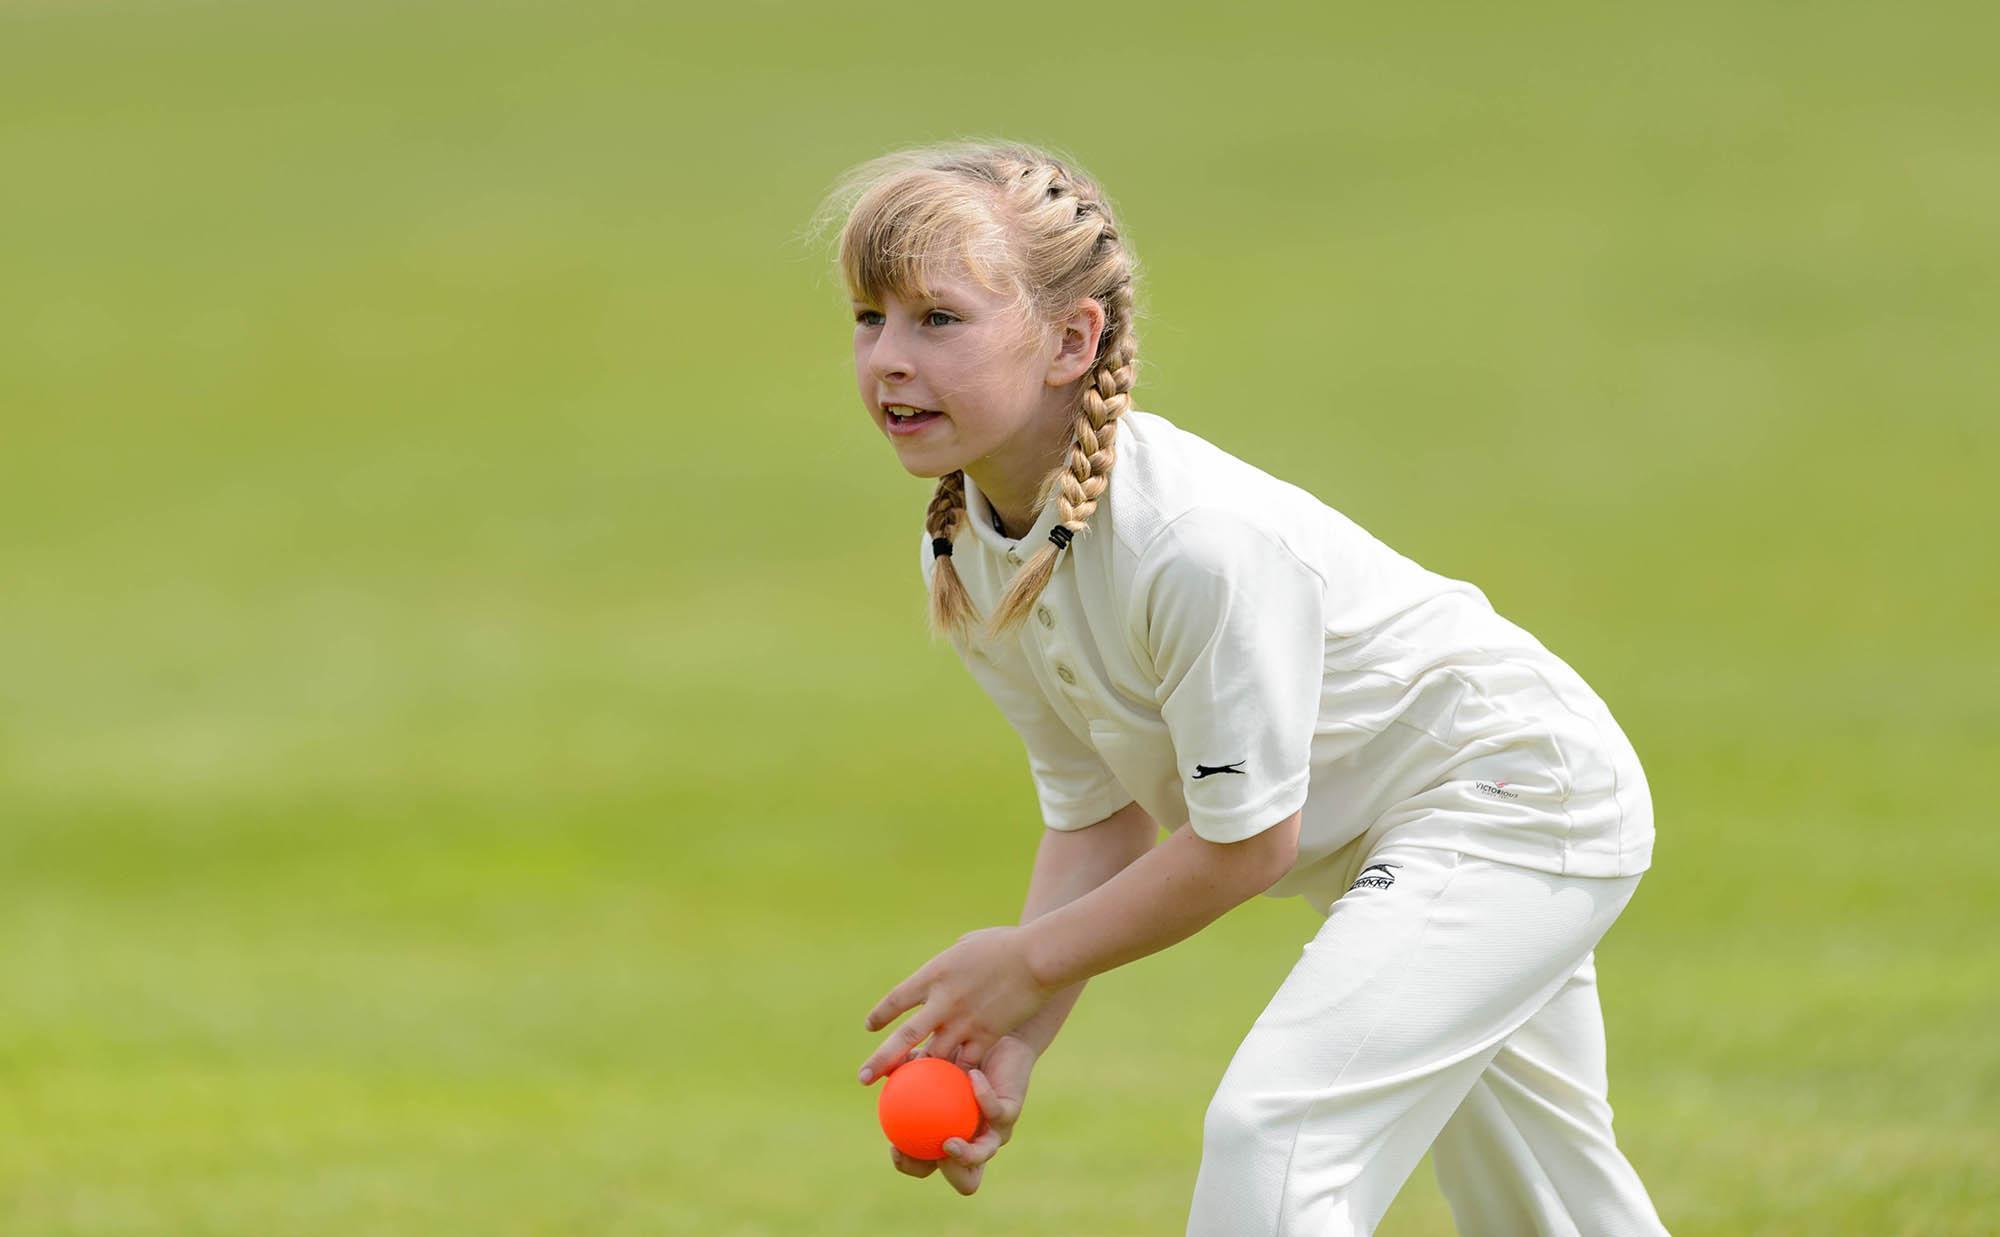 manchester-sport-youth-cricket-plus-tennis-0356.jpg.JPG